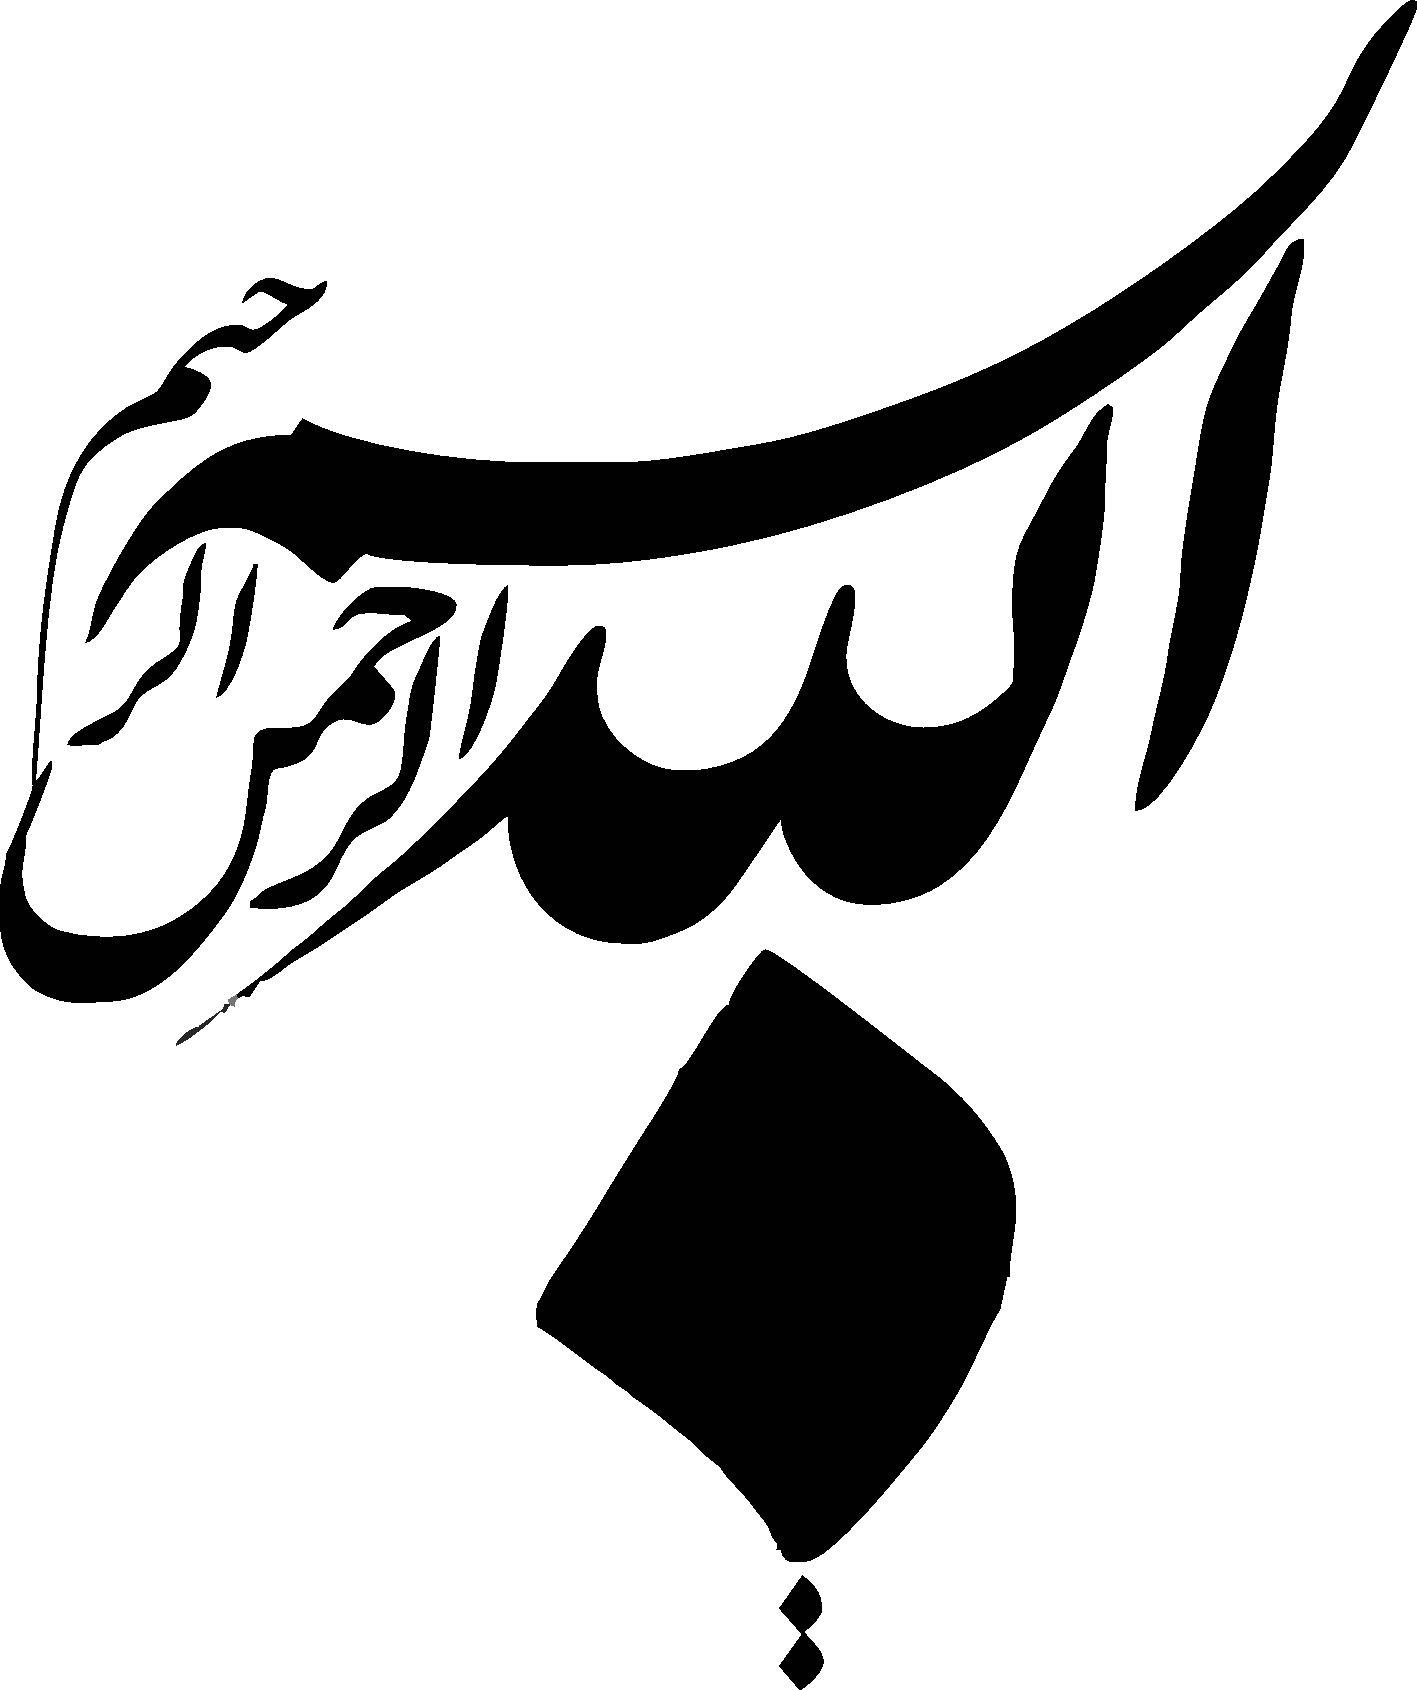 داستان بسم الله گفتن حضرت رسول (ص ) و دفع سم